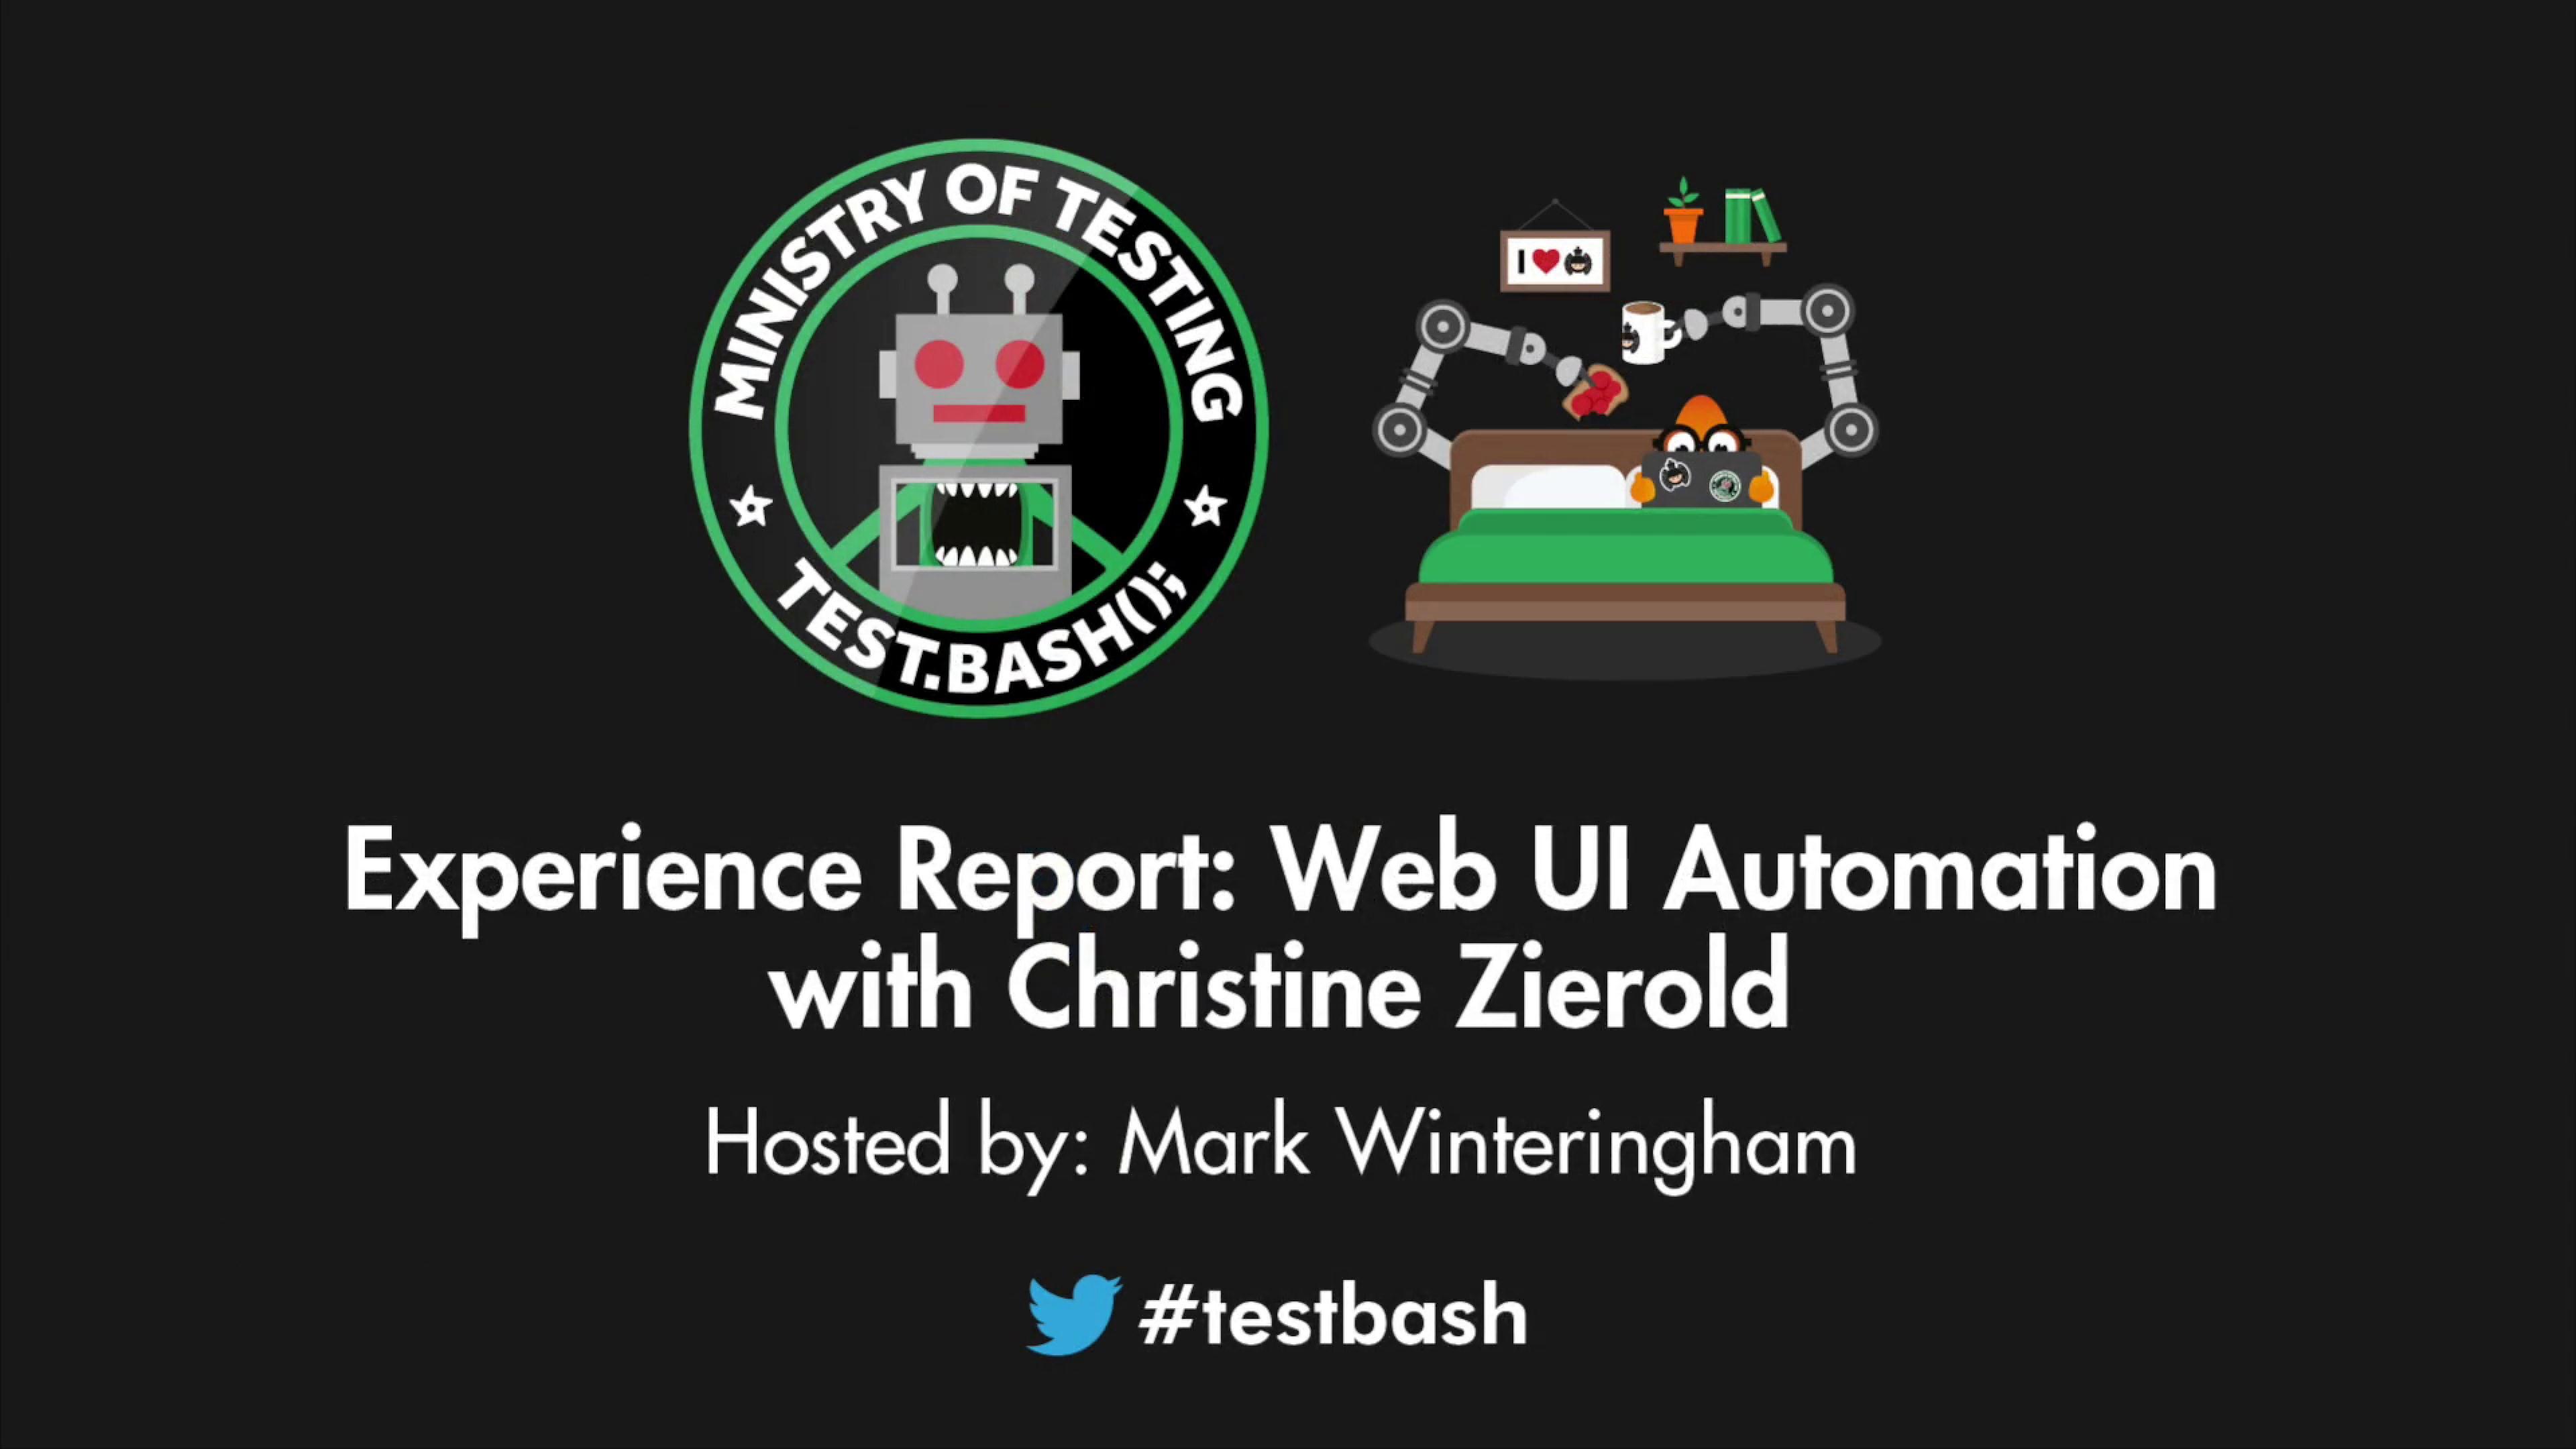 Experience Report: Web UI Automation - Christine Zierold